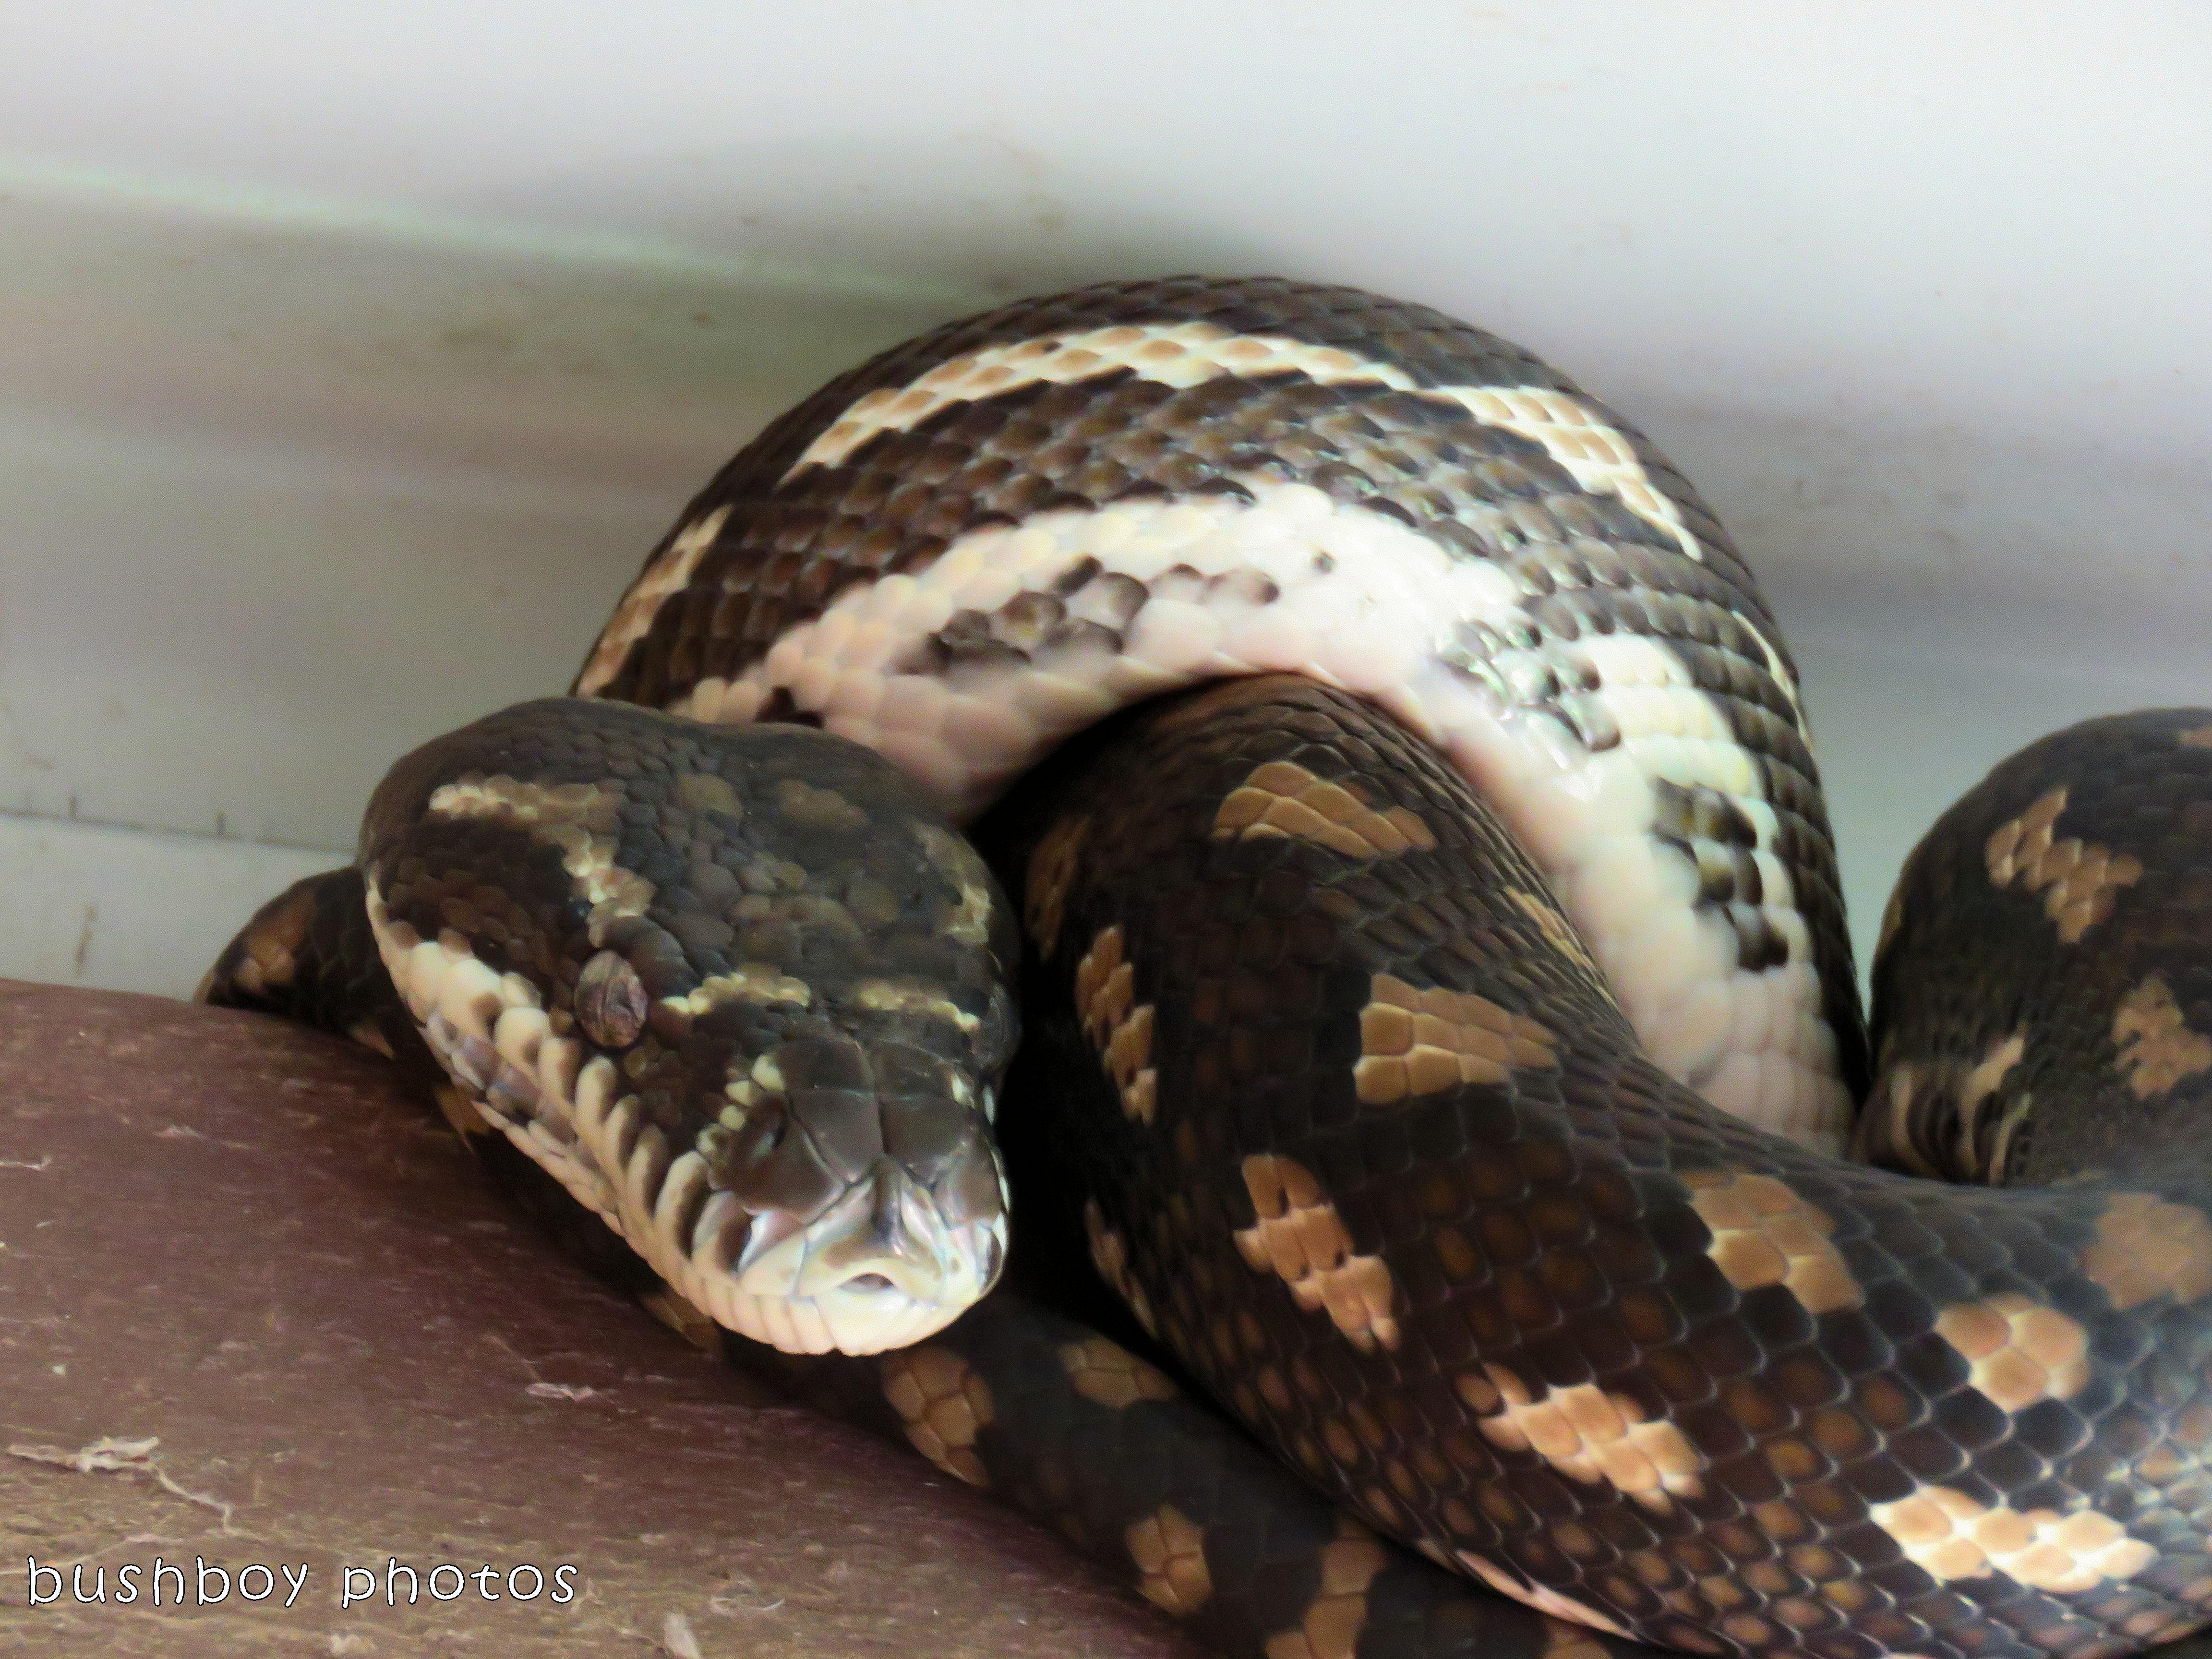 180215_letter z_snake close